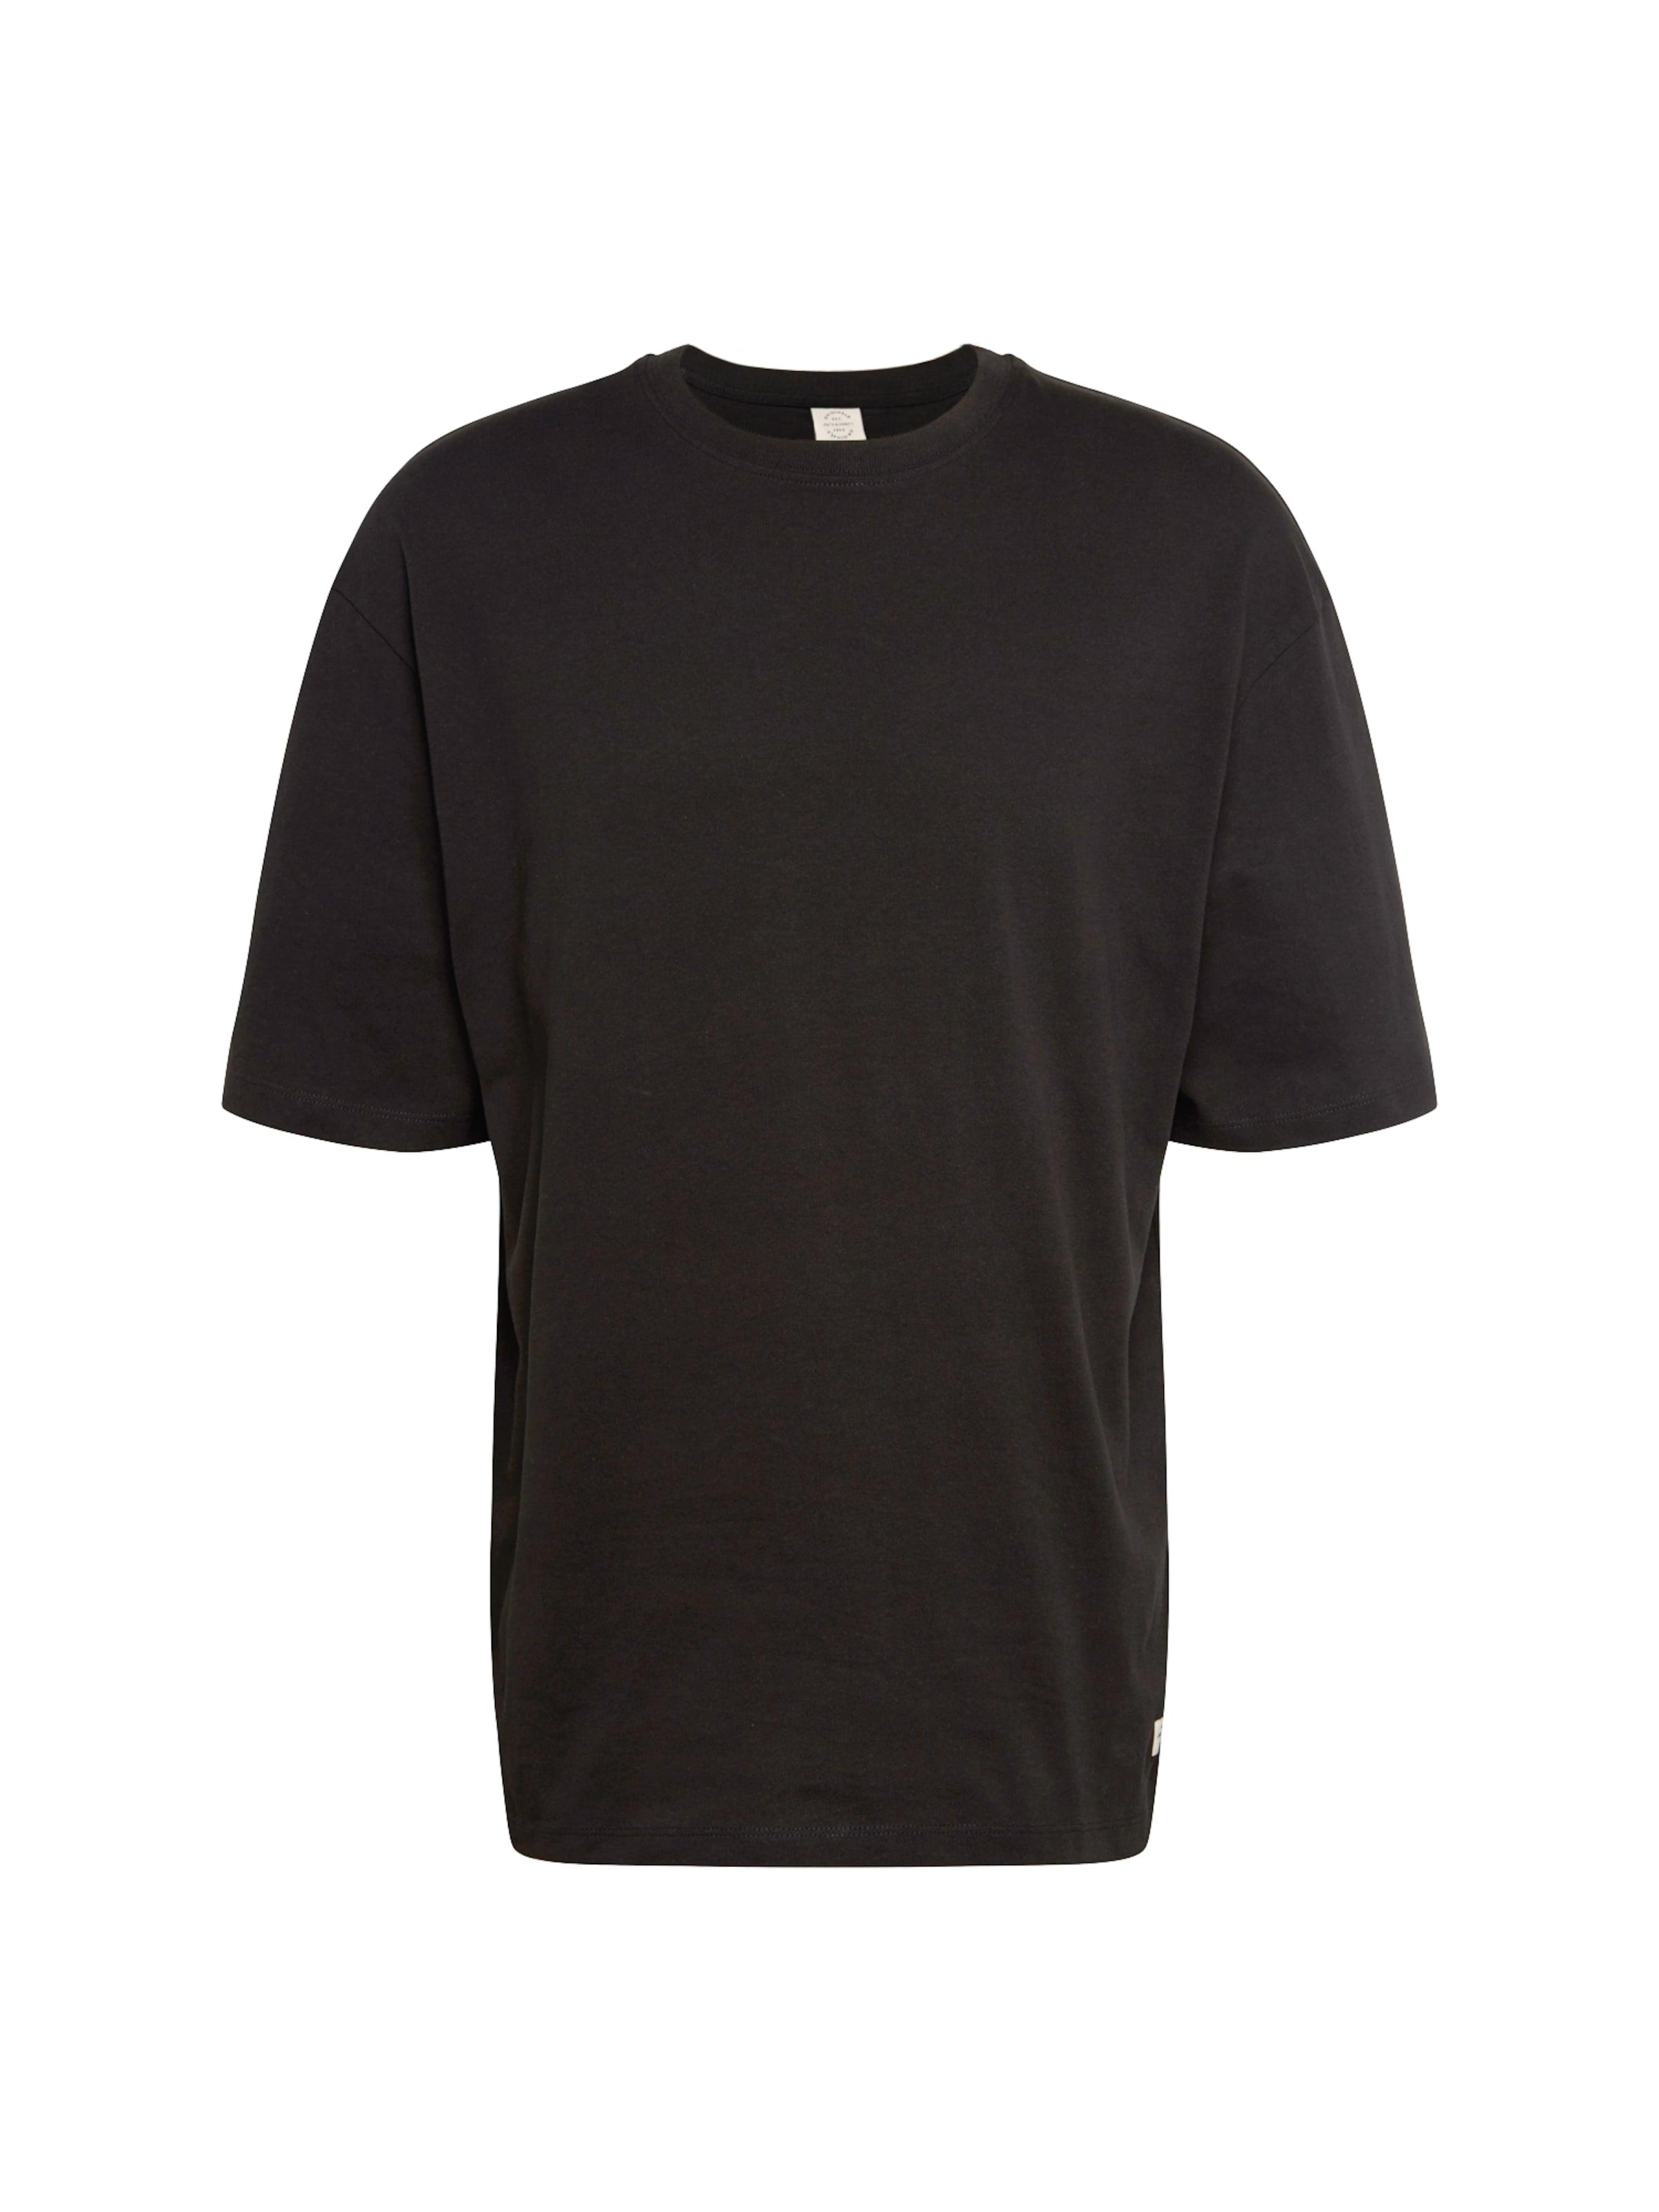 En Jones T shirt Rouge 'jorskyler' Jackamp; J31uFTlKc5